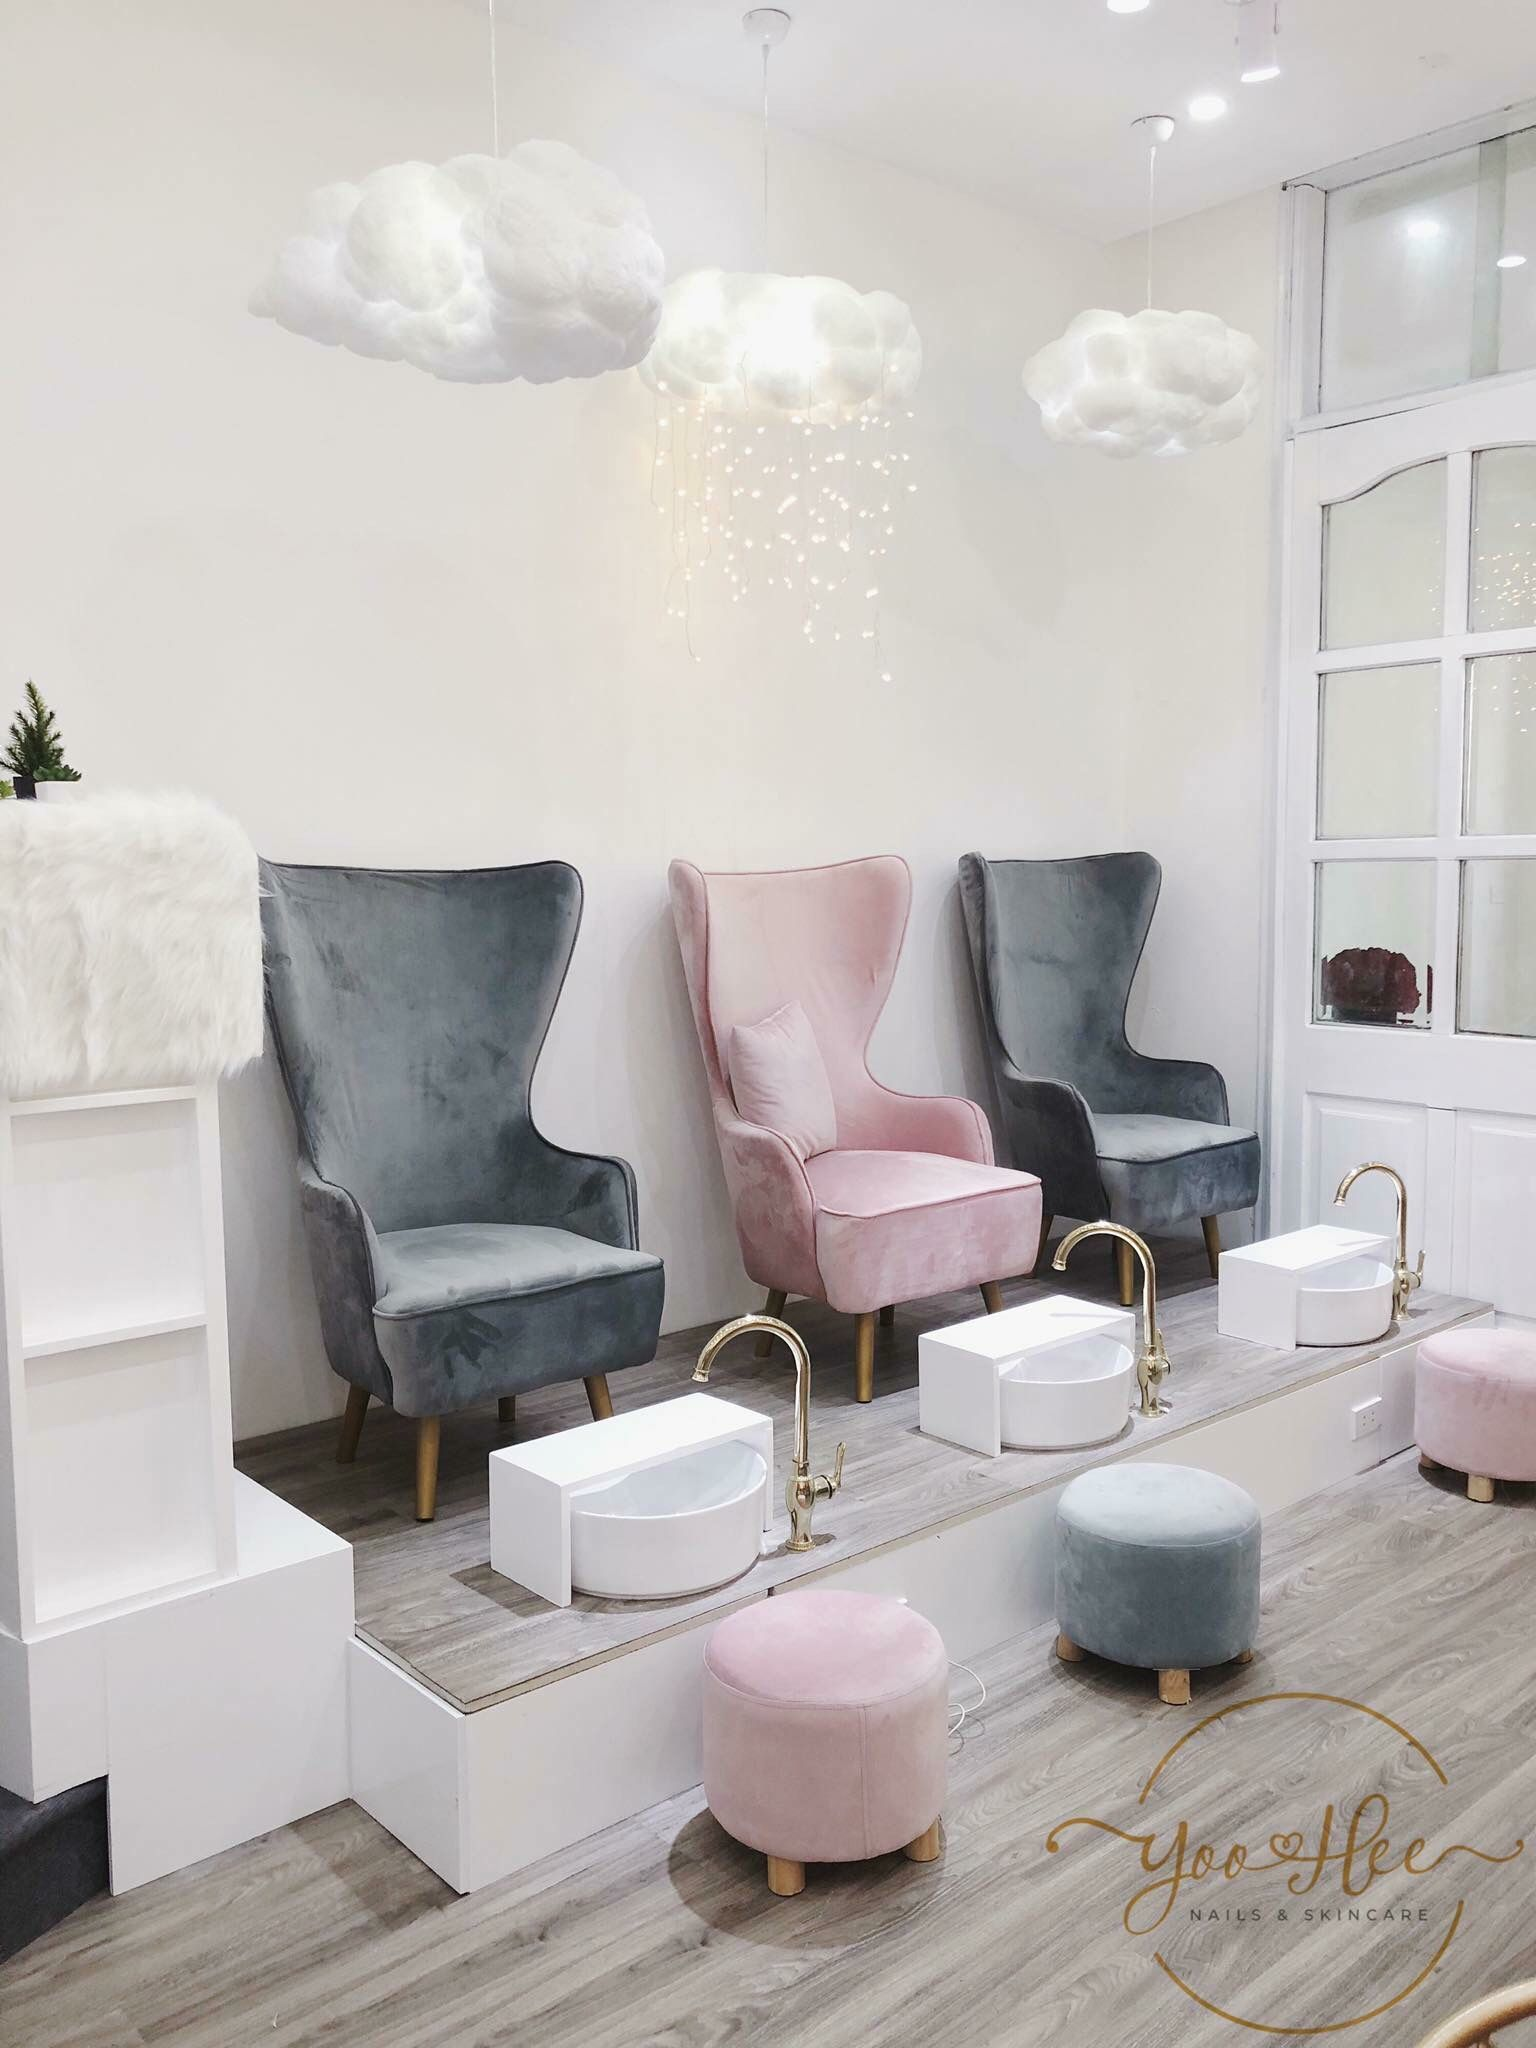 salon interior design software #makeup salon interior design #spa